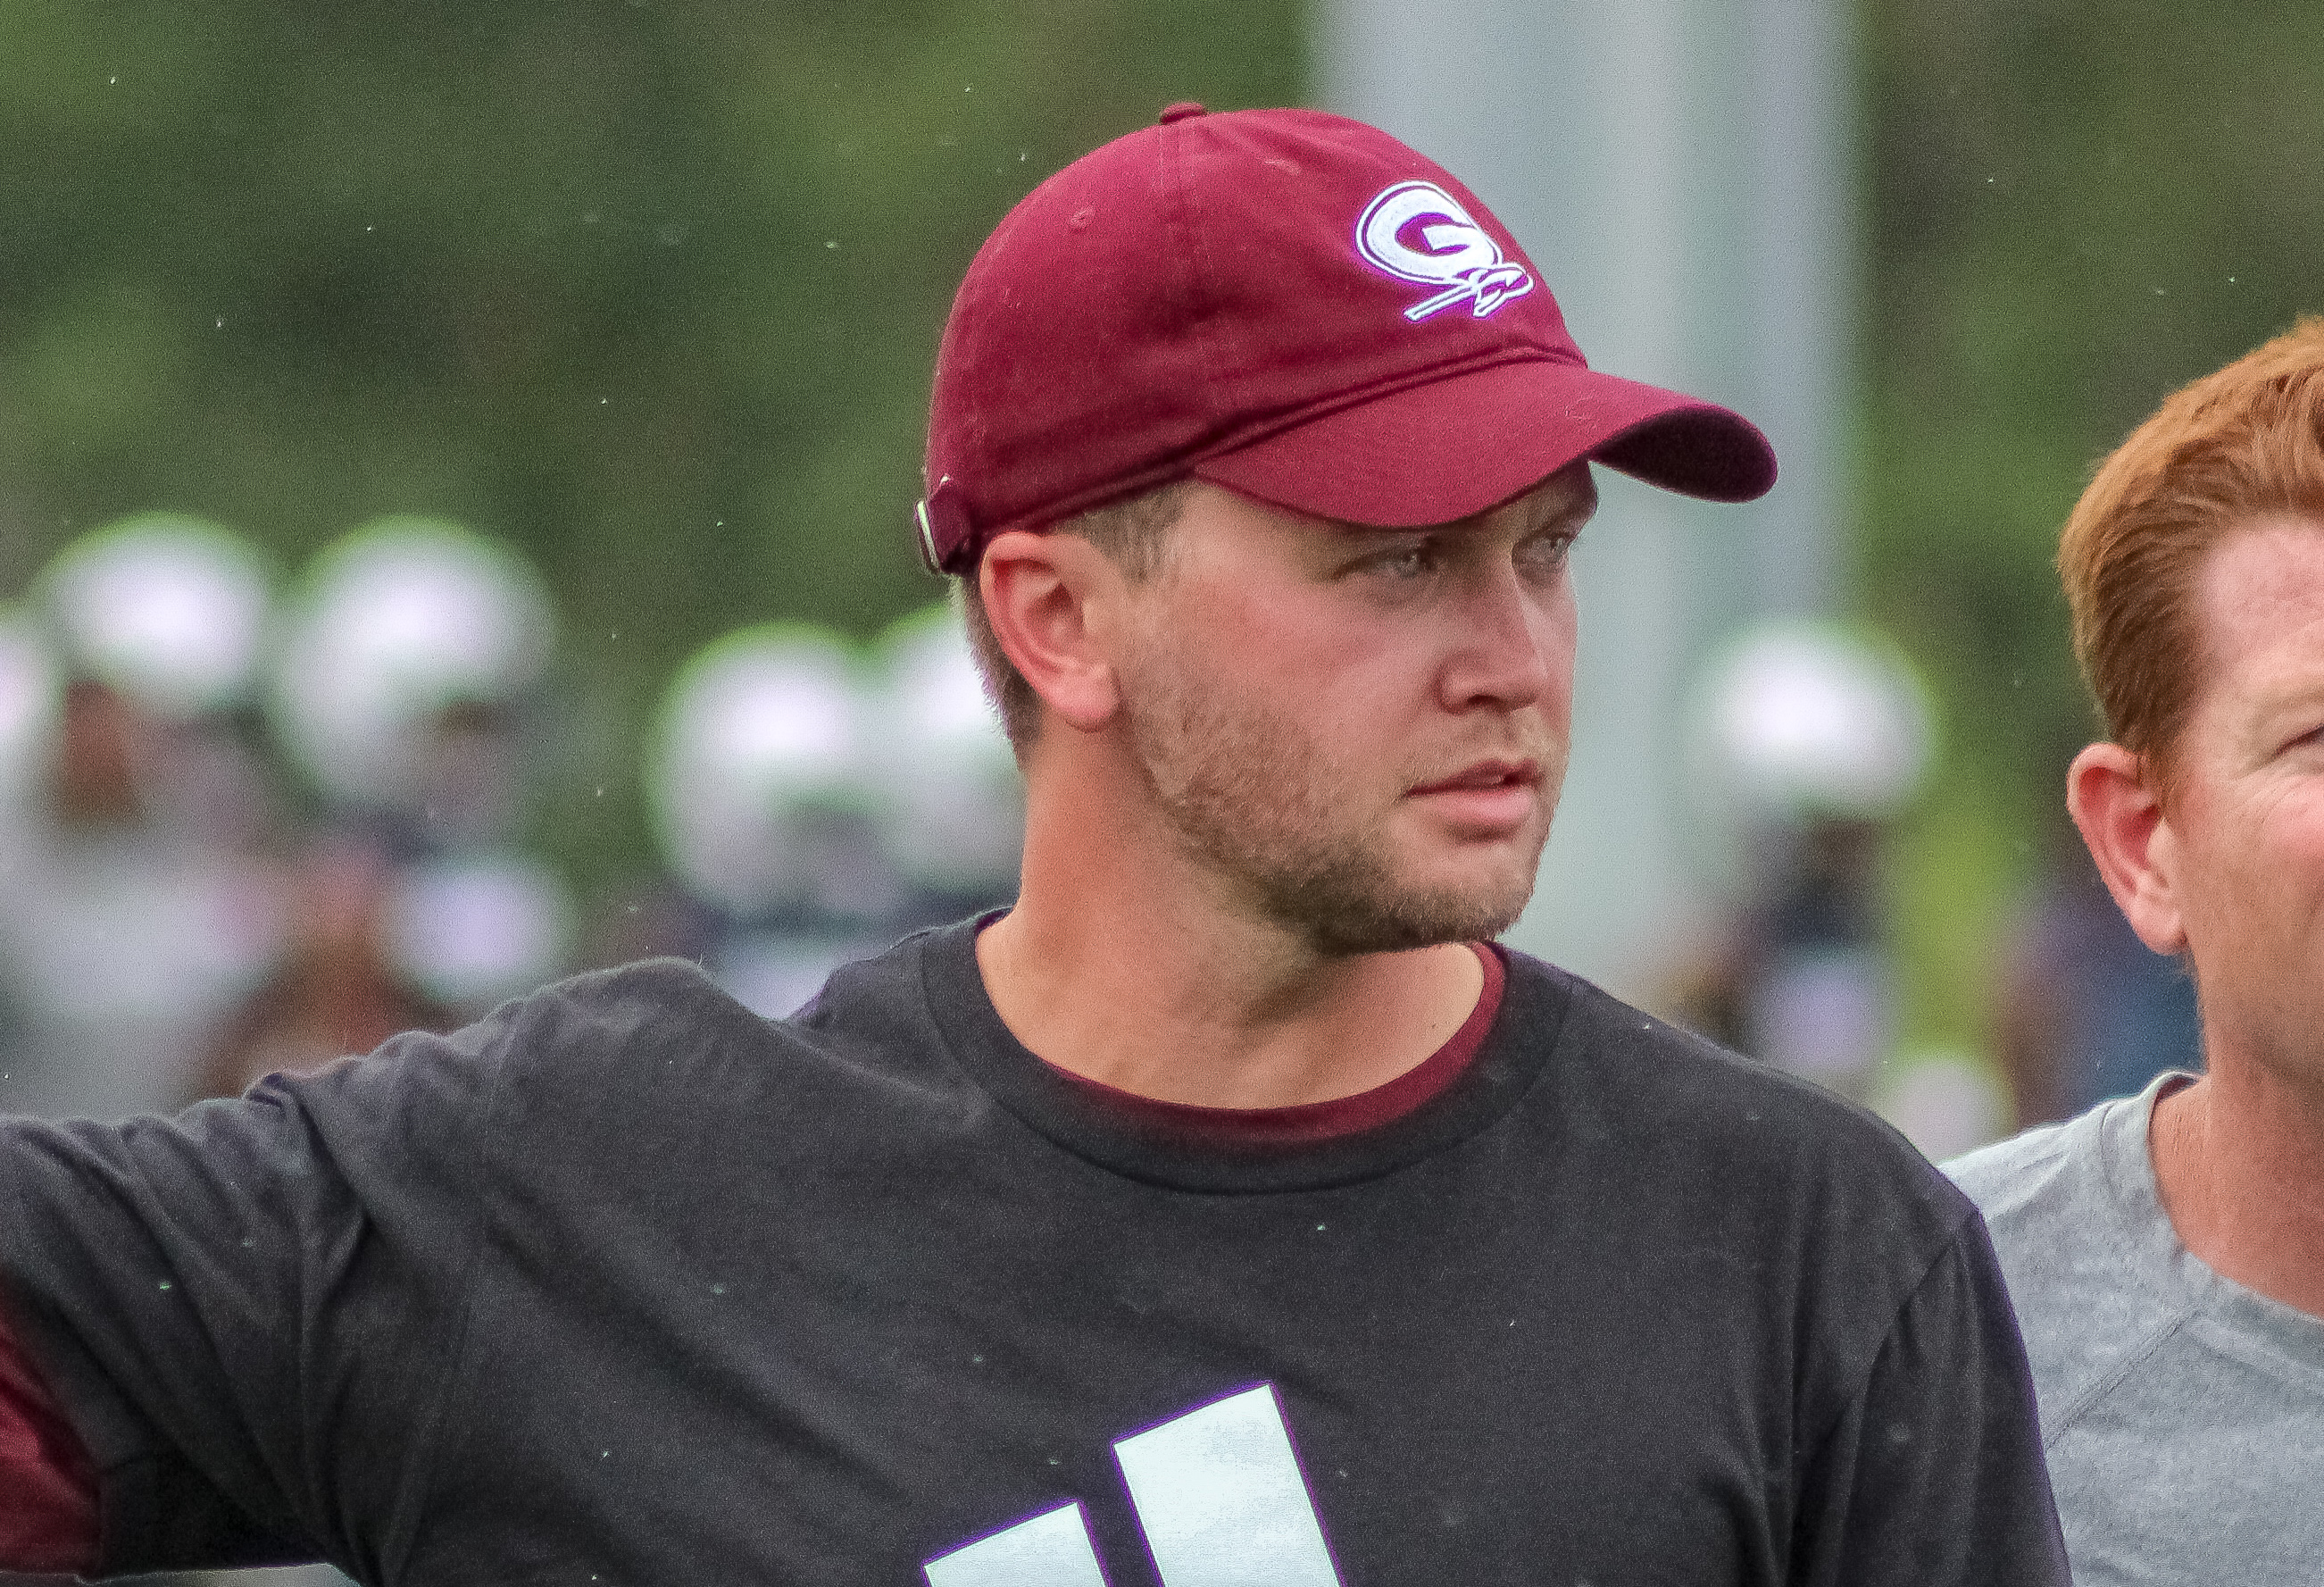 Gardendale High School assistant coach William Eads